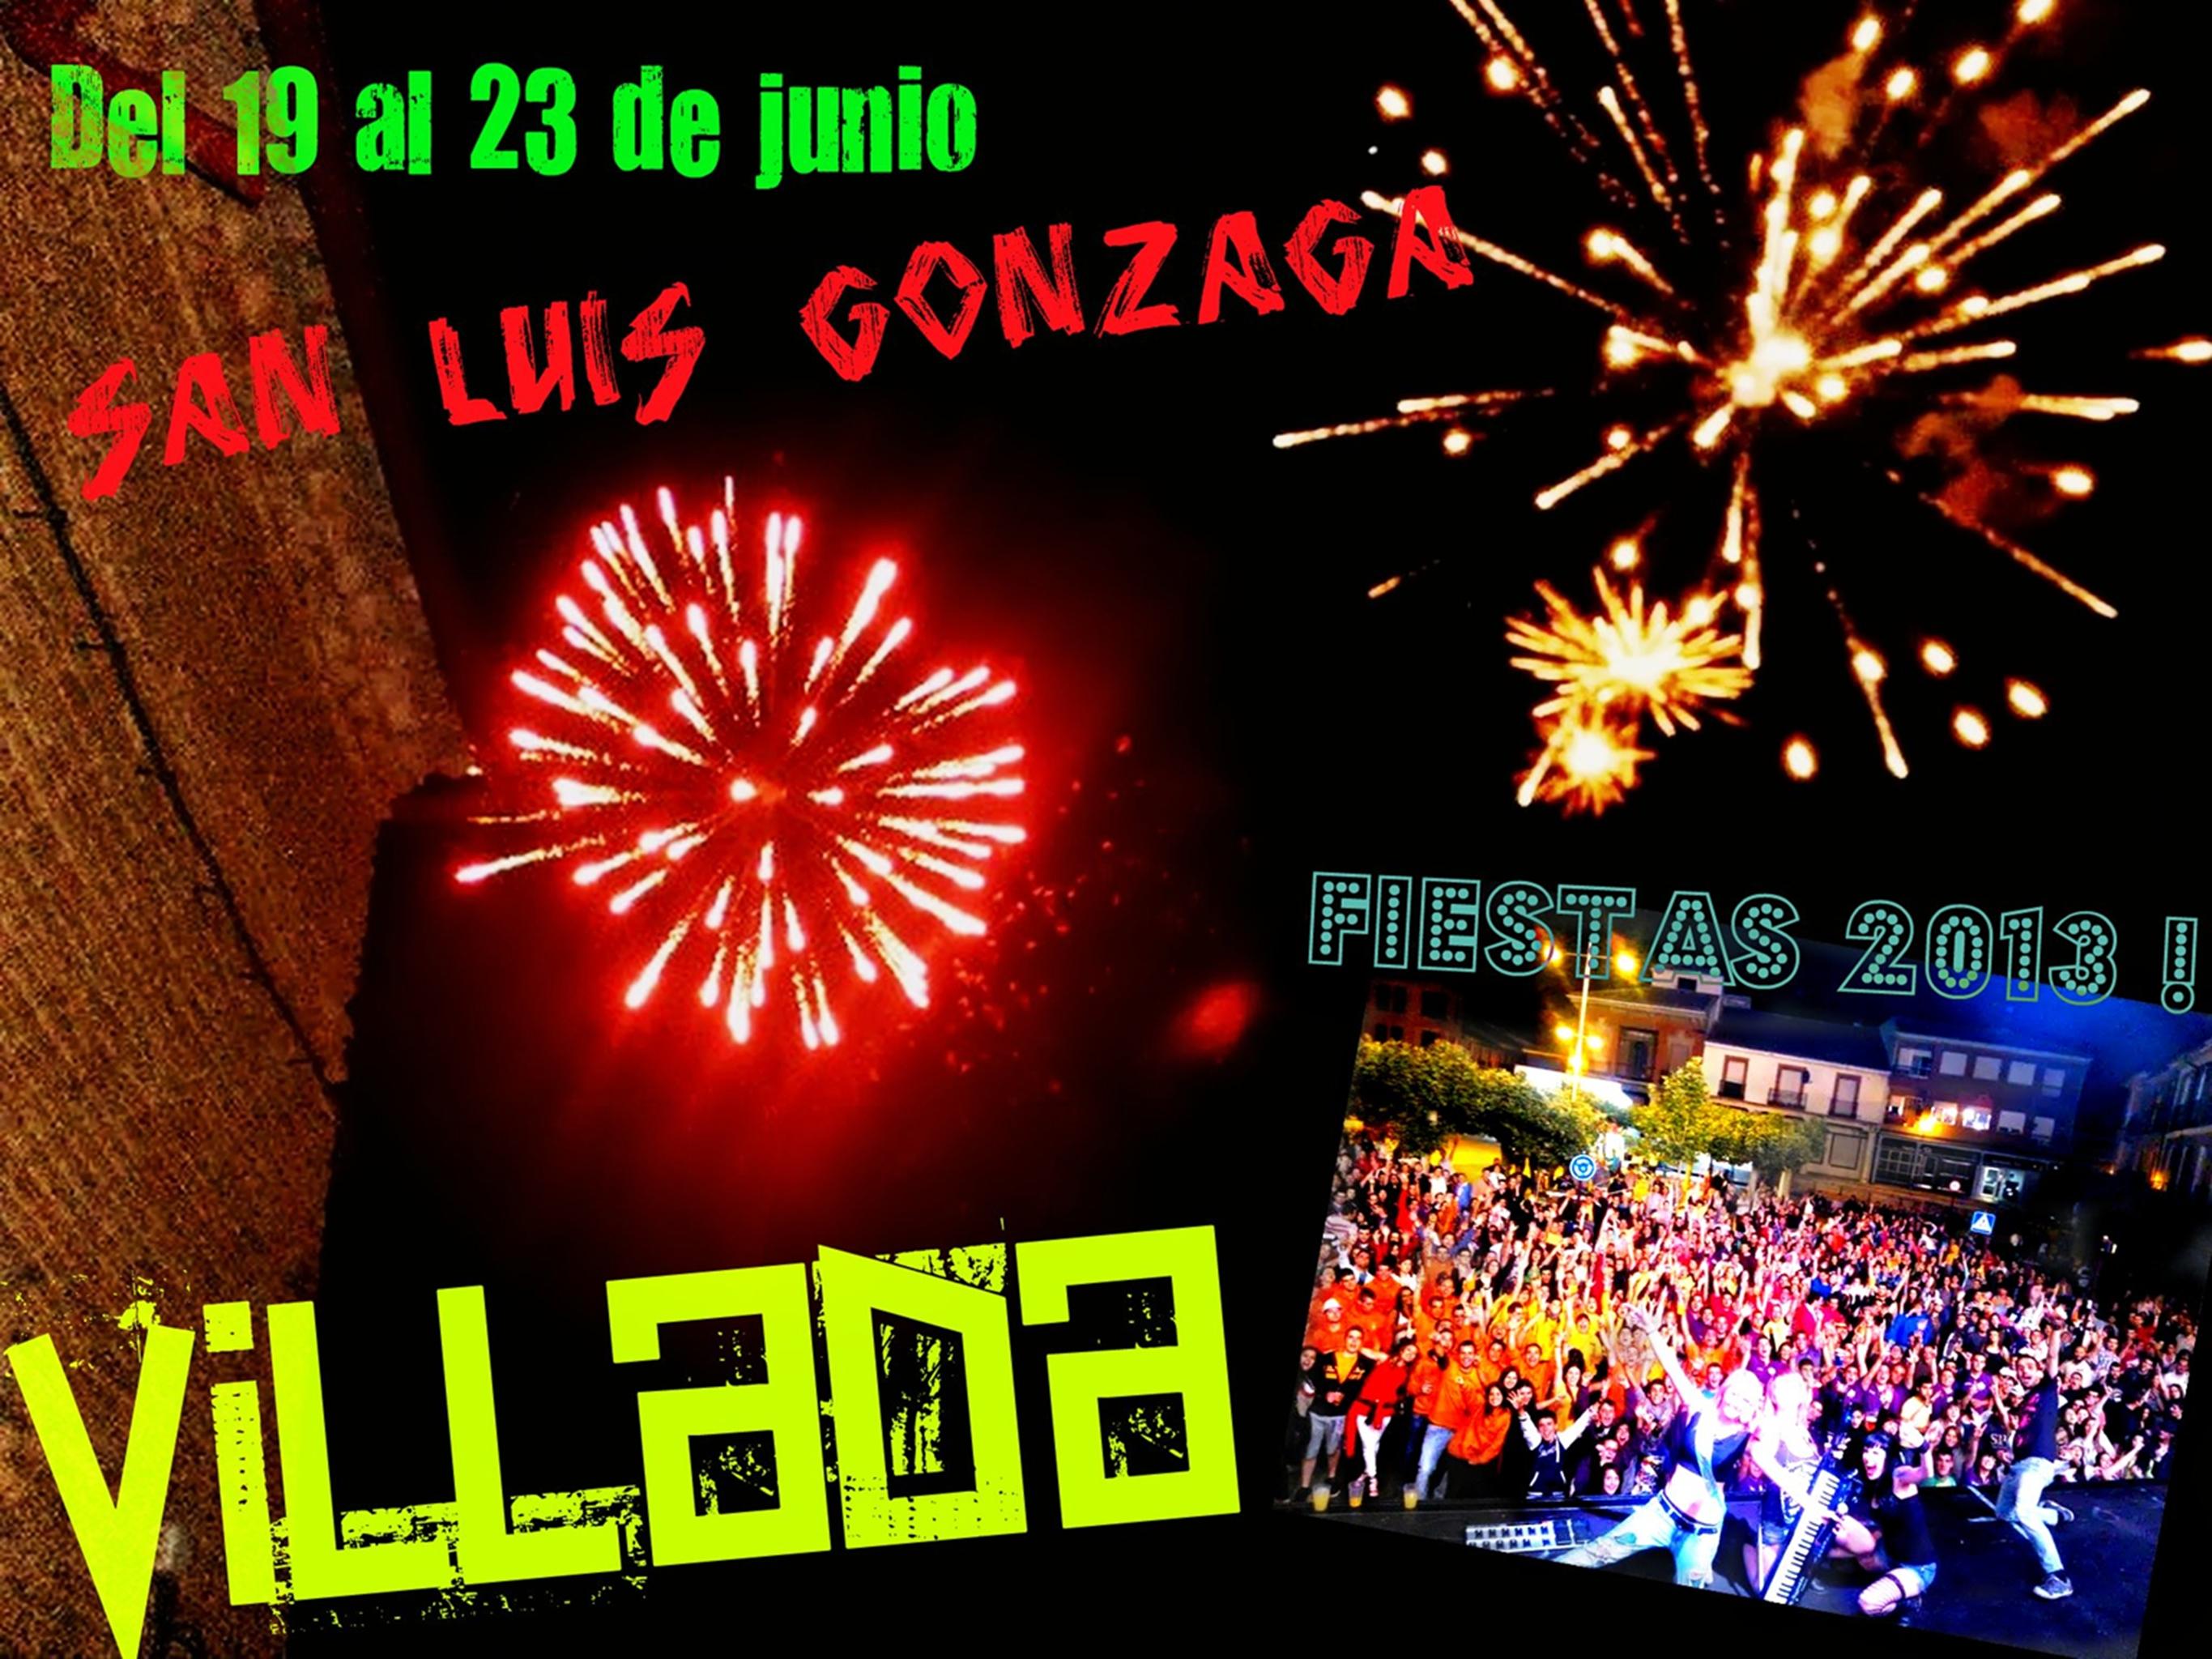 Fiestas San Luis Gonzaga 2013